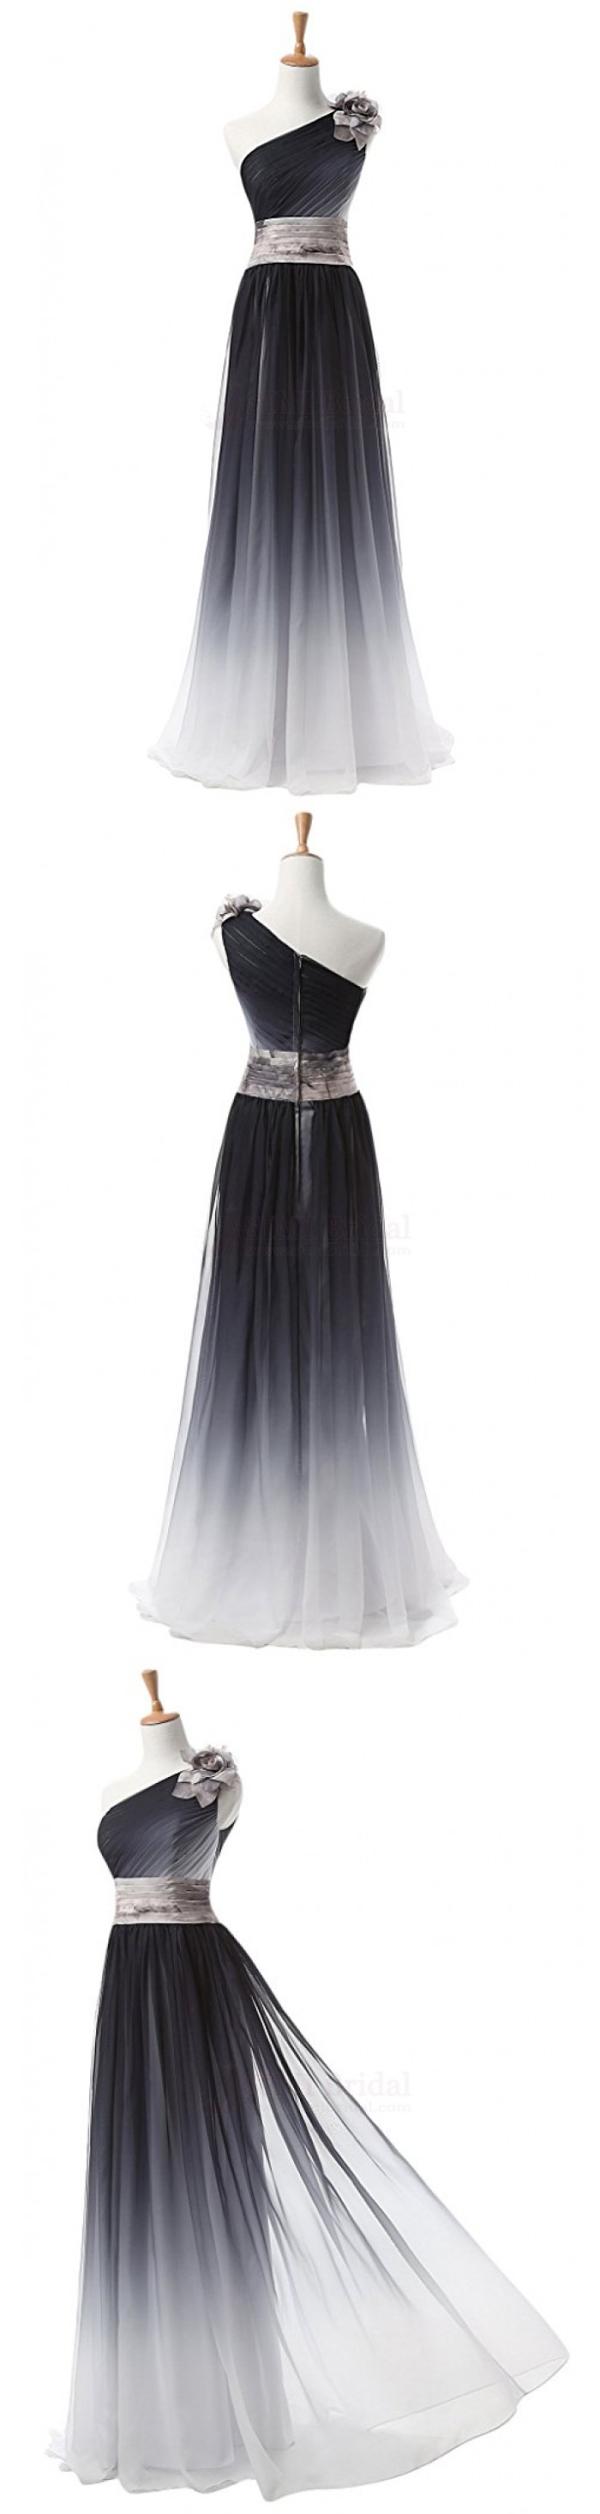 cheap bridesmaid dresses one shoulder simple long bridesmaid